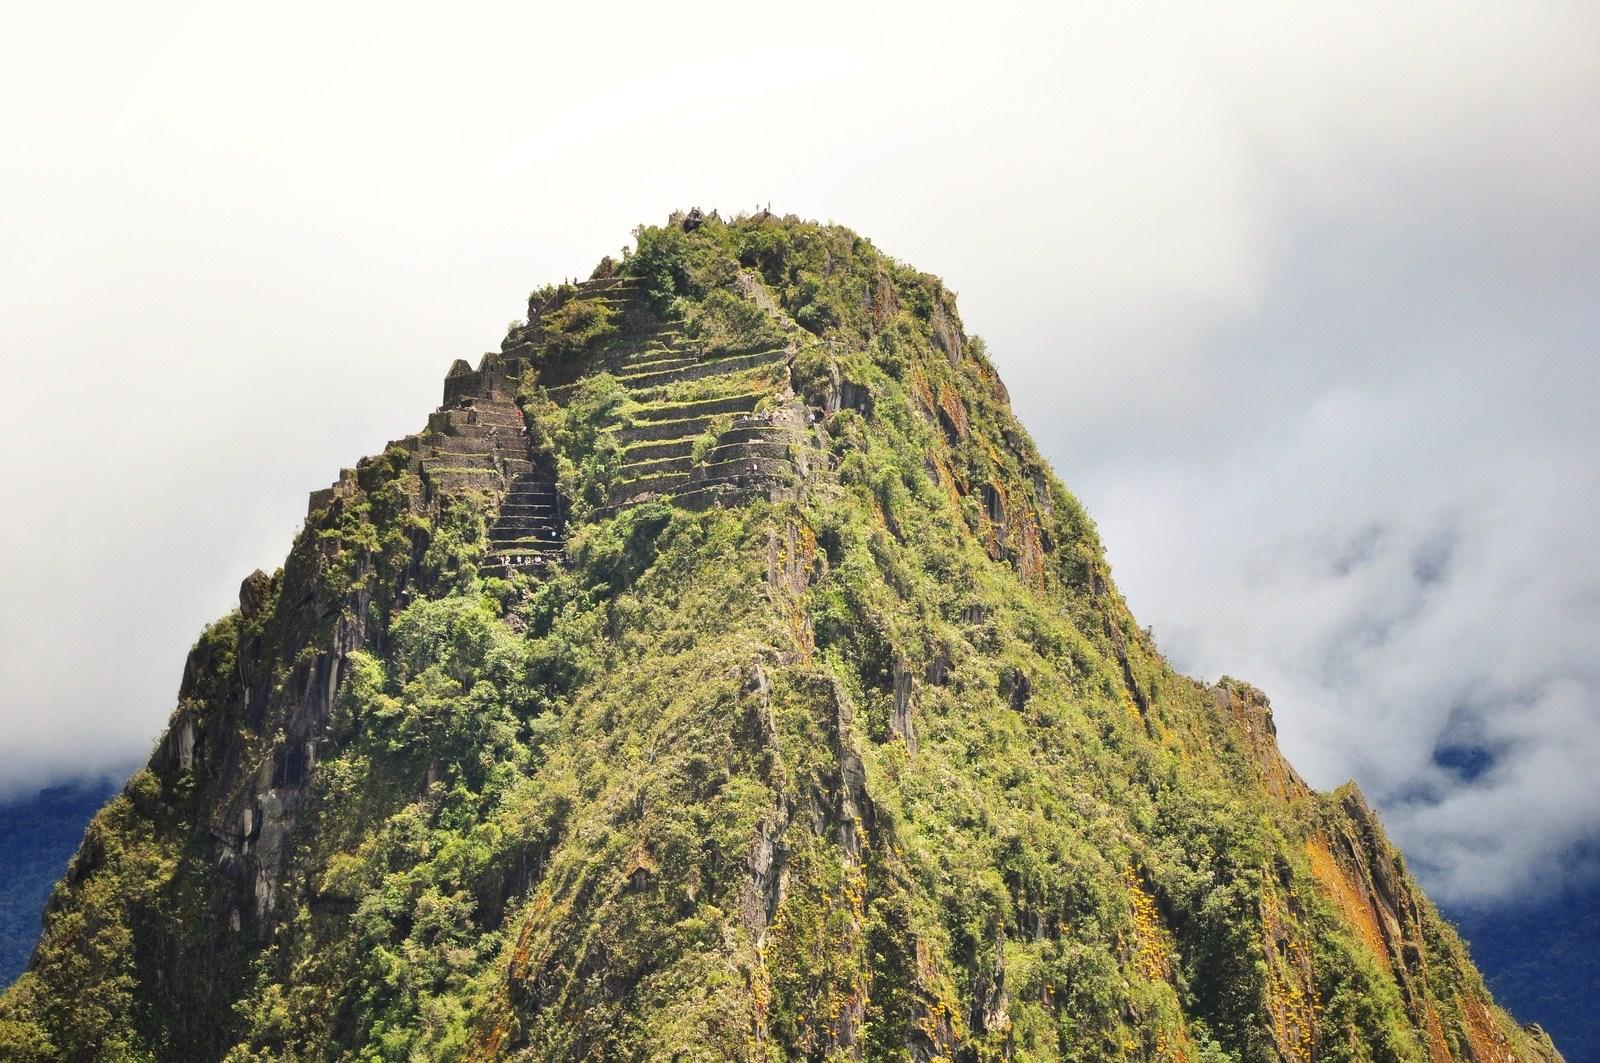 Wayna Picchu Machu Picchu